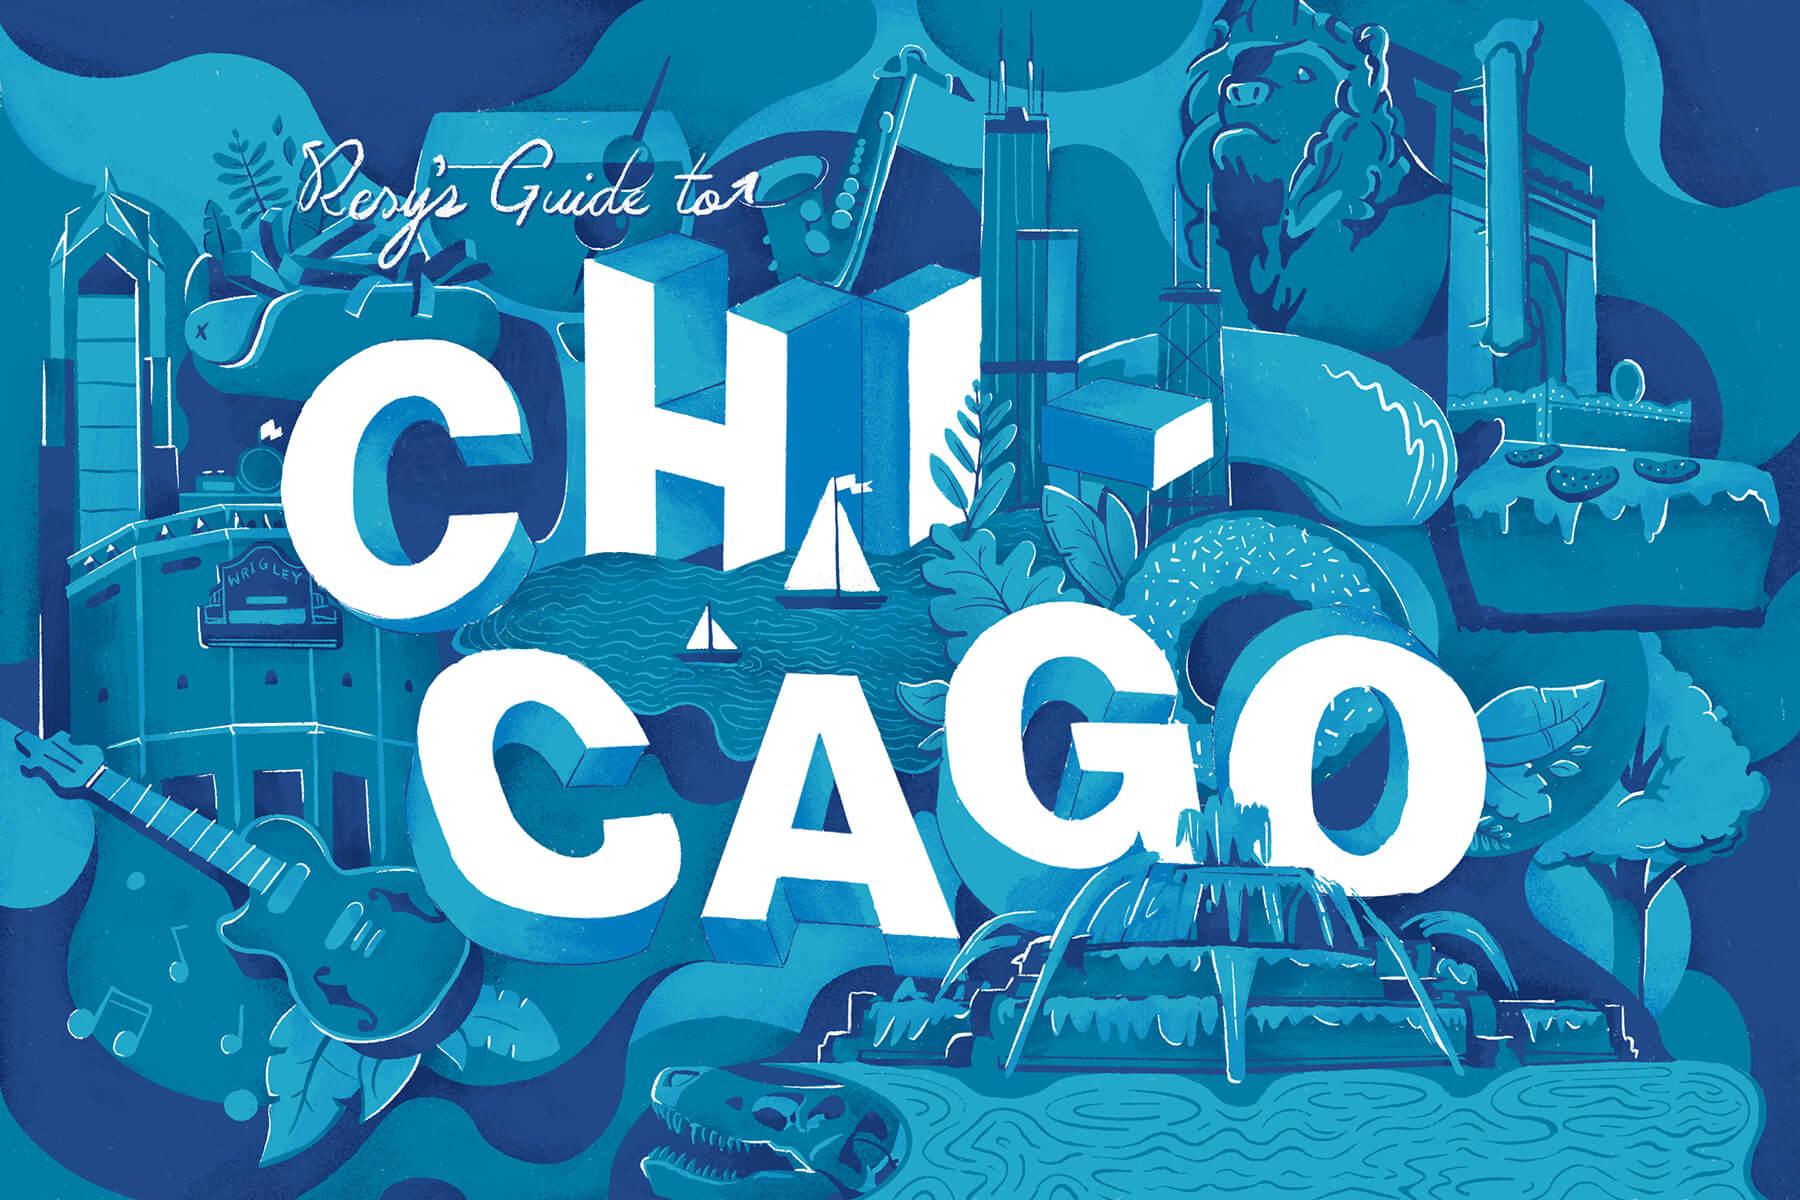 chicago-city-illustration-concept.jpg